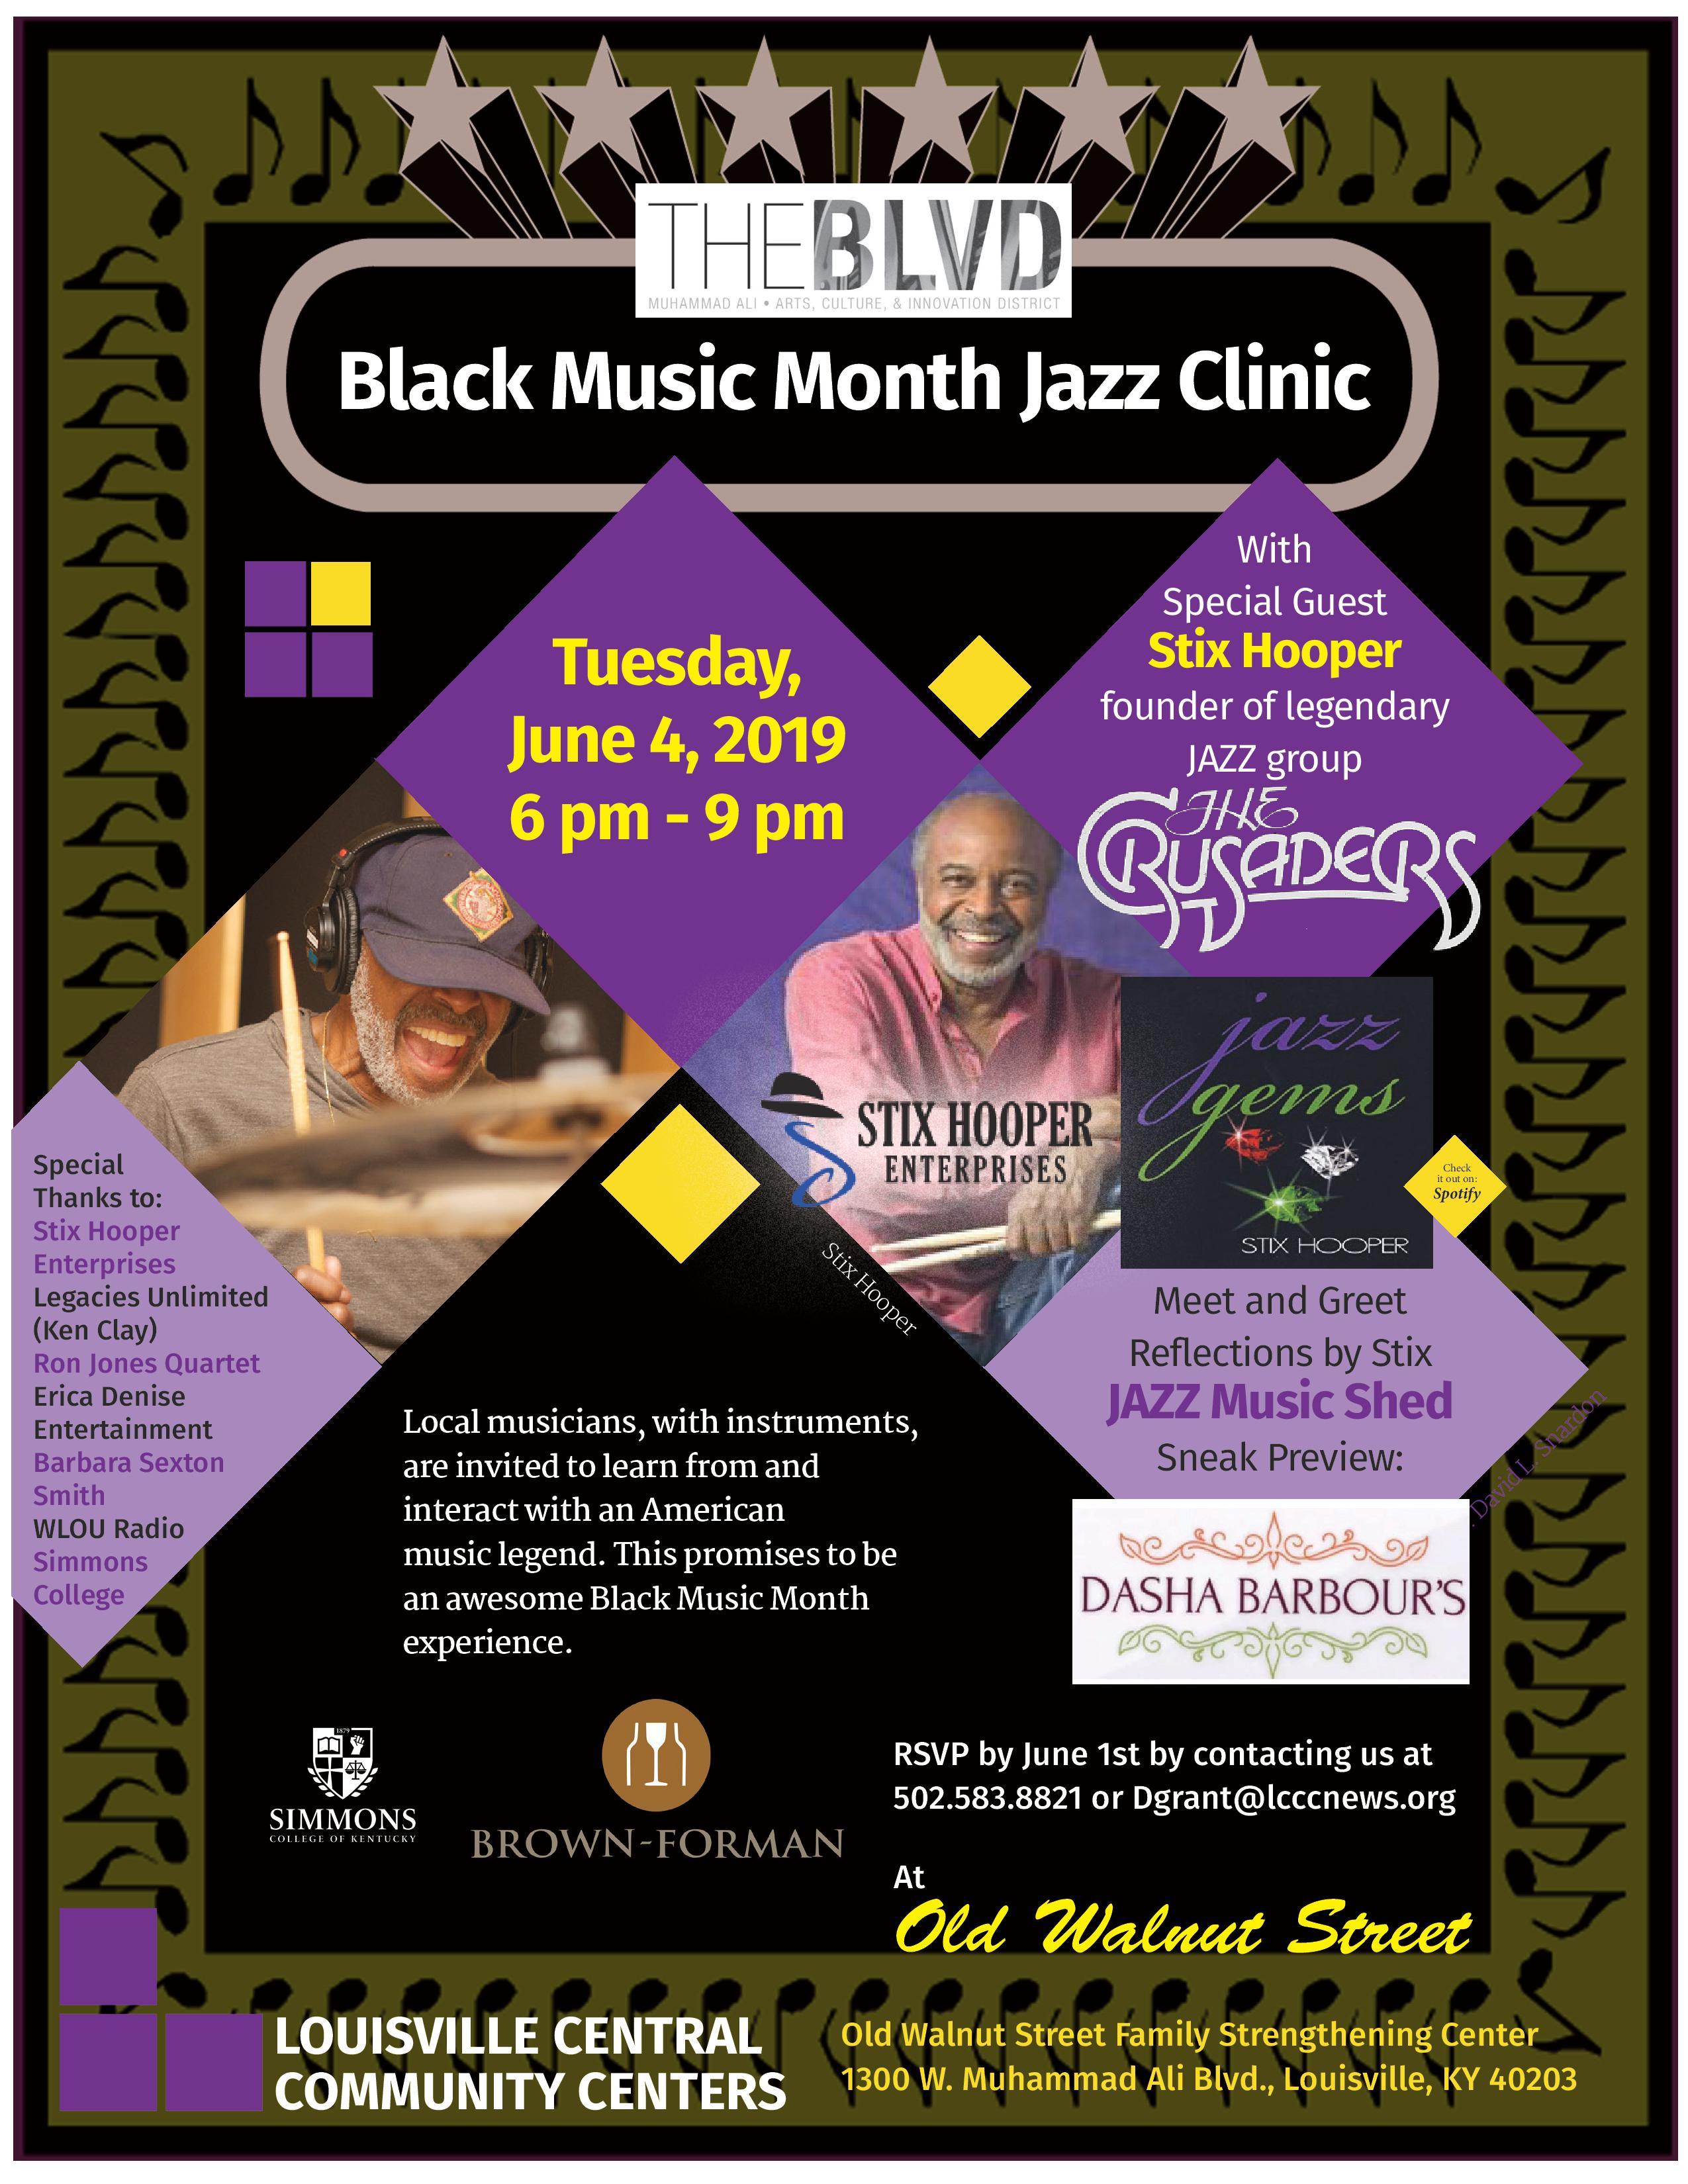 Black Music Month Jazz Clinic